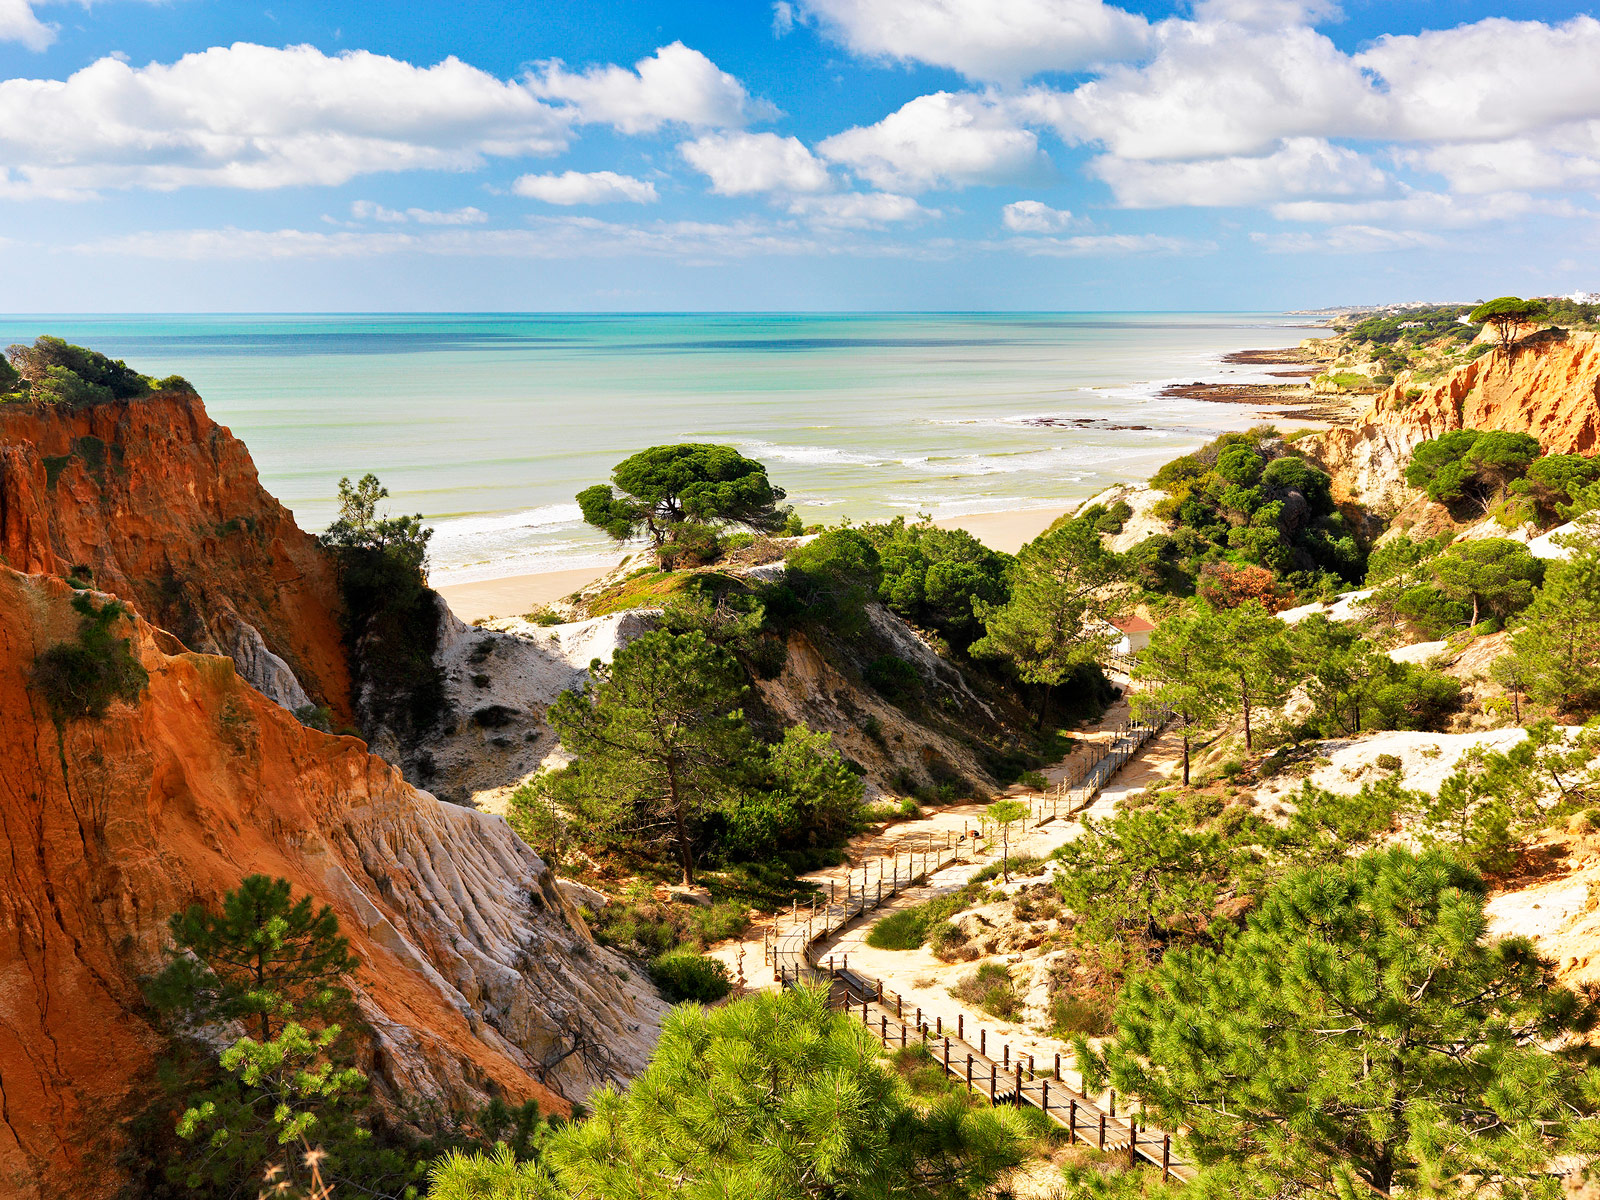 Pine cliffs ocean suites luxury launch on the algarve for Hotel luxury algarve